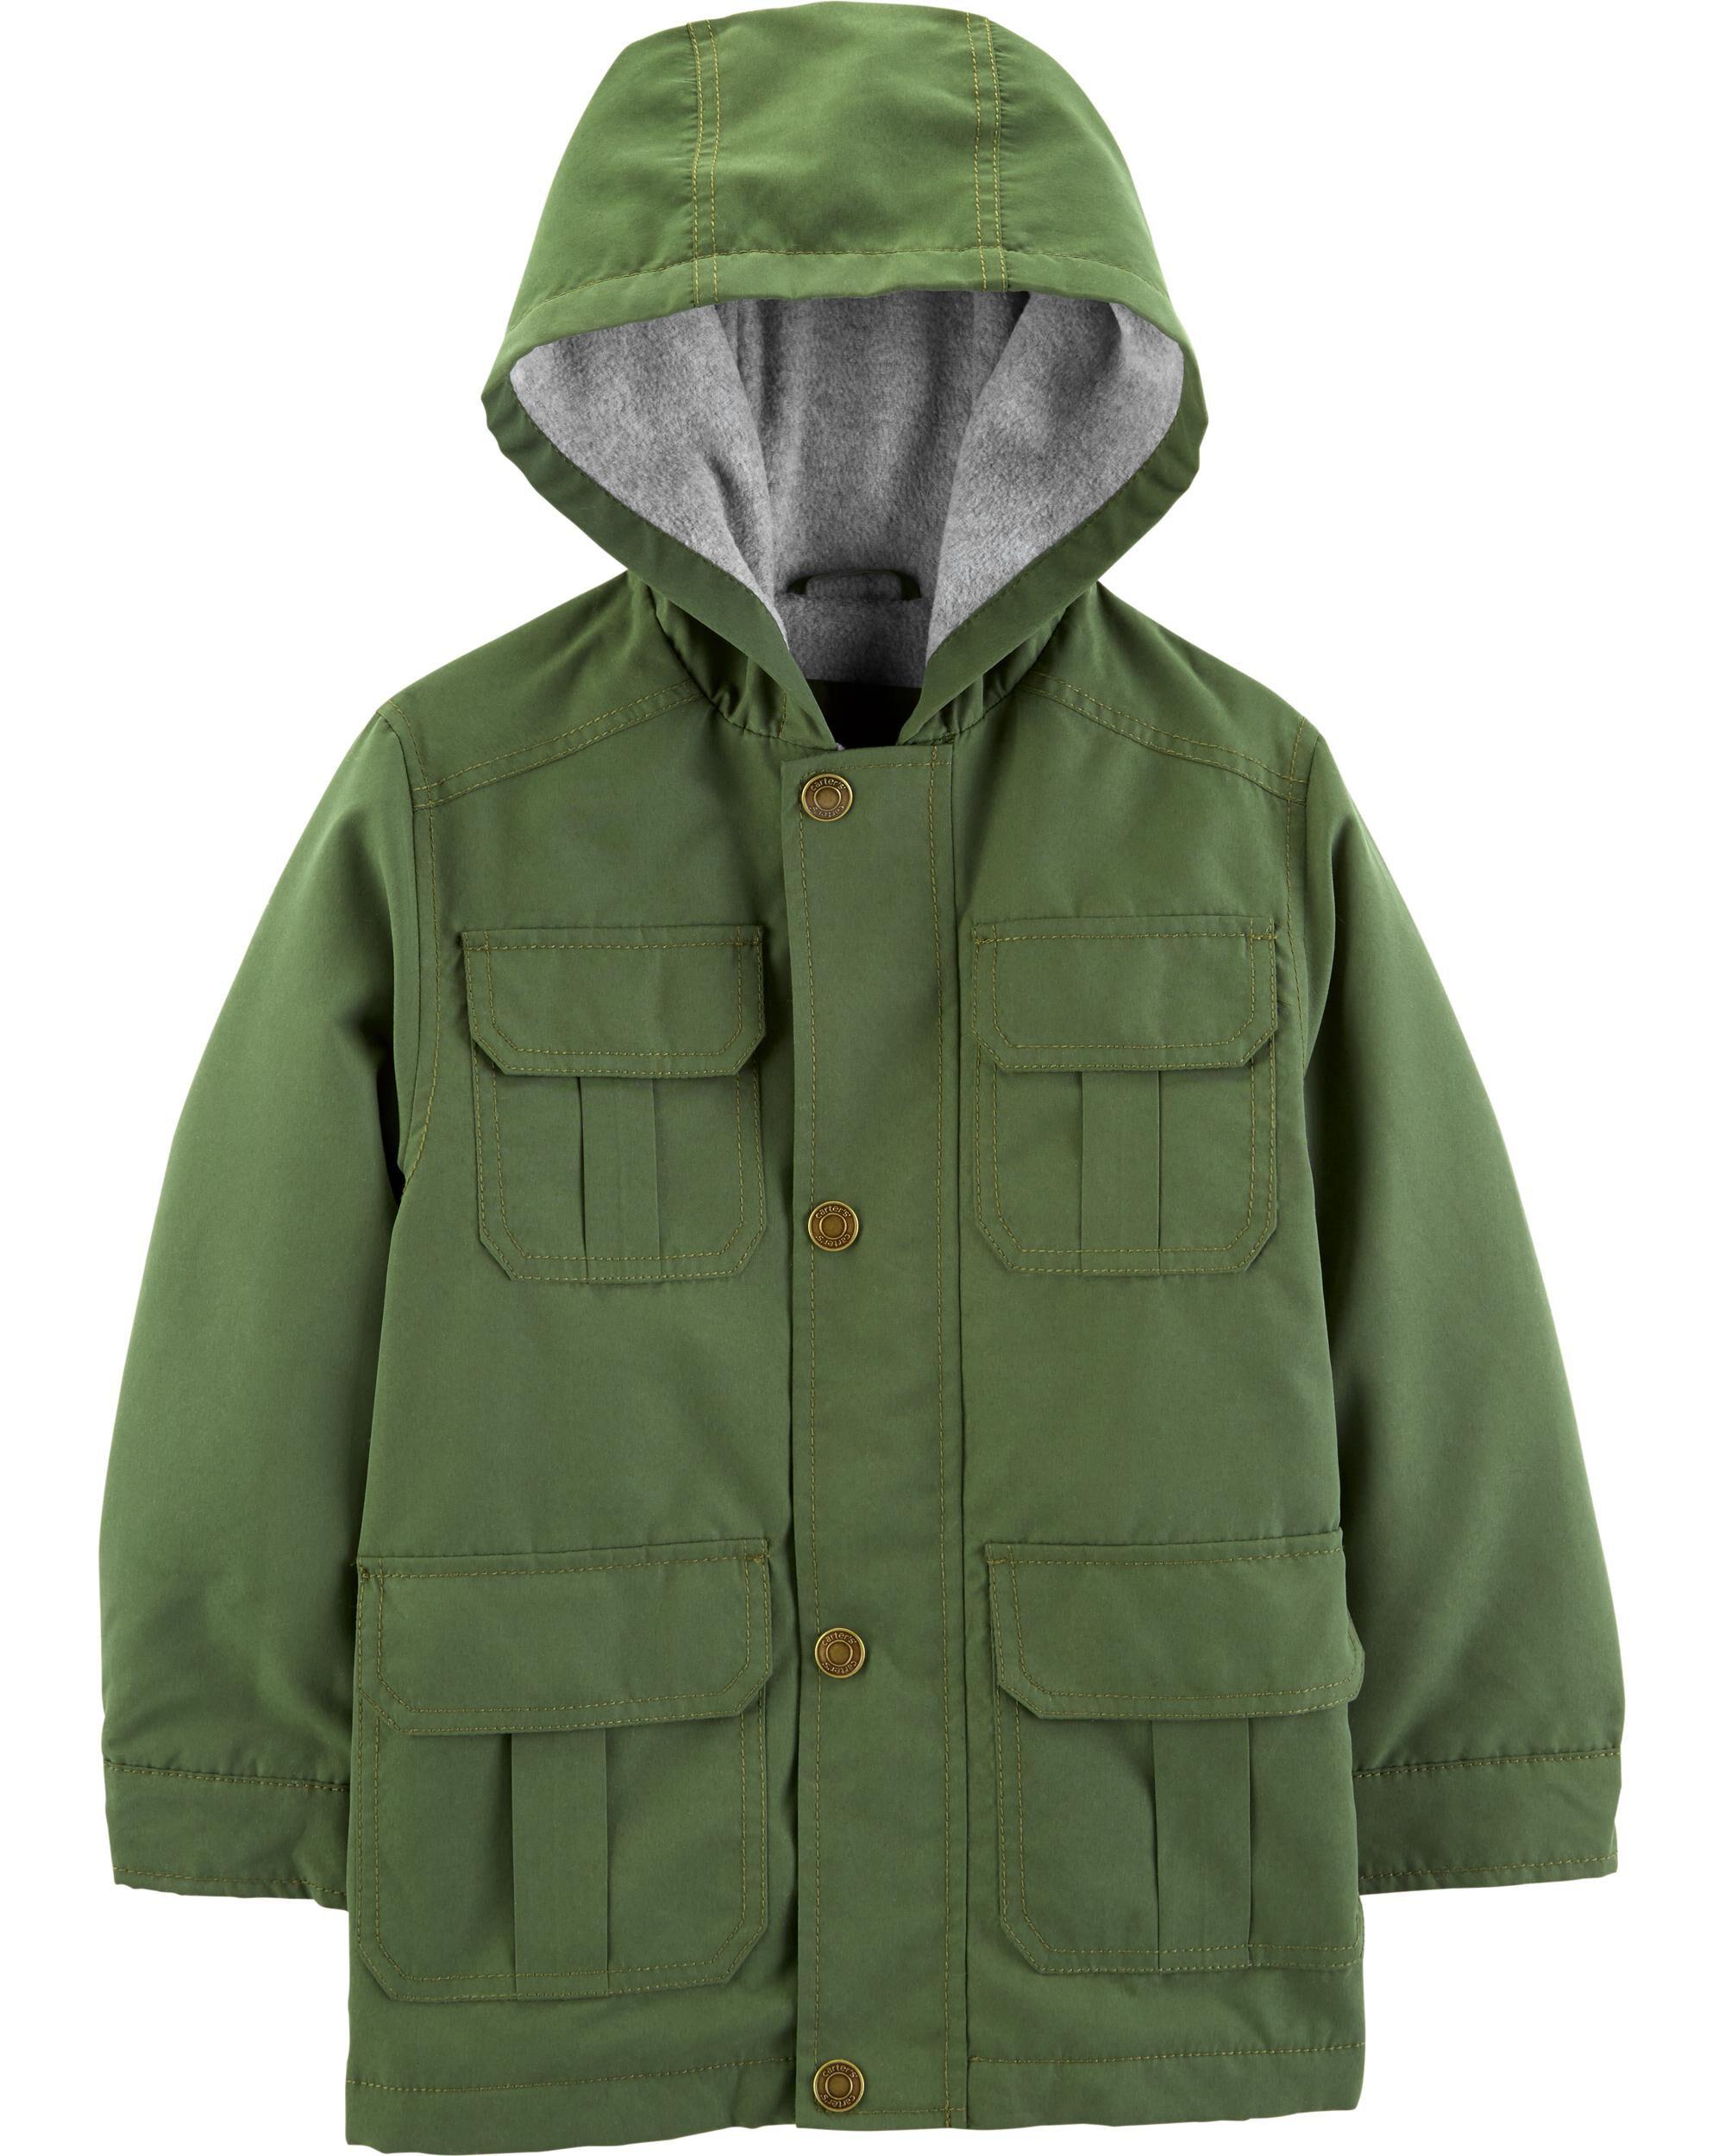 *CLEARANCE* Fleece-Lined Jacket